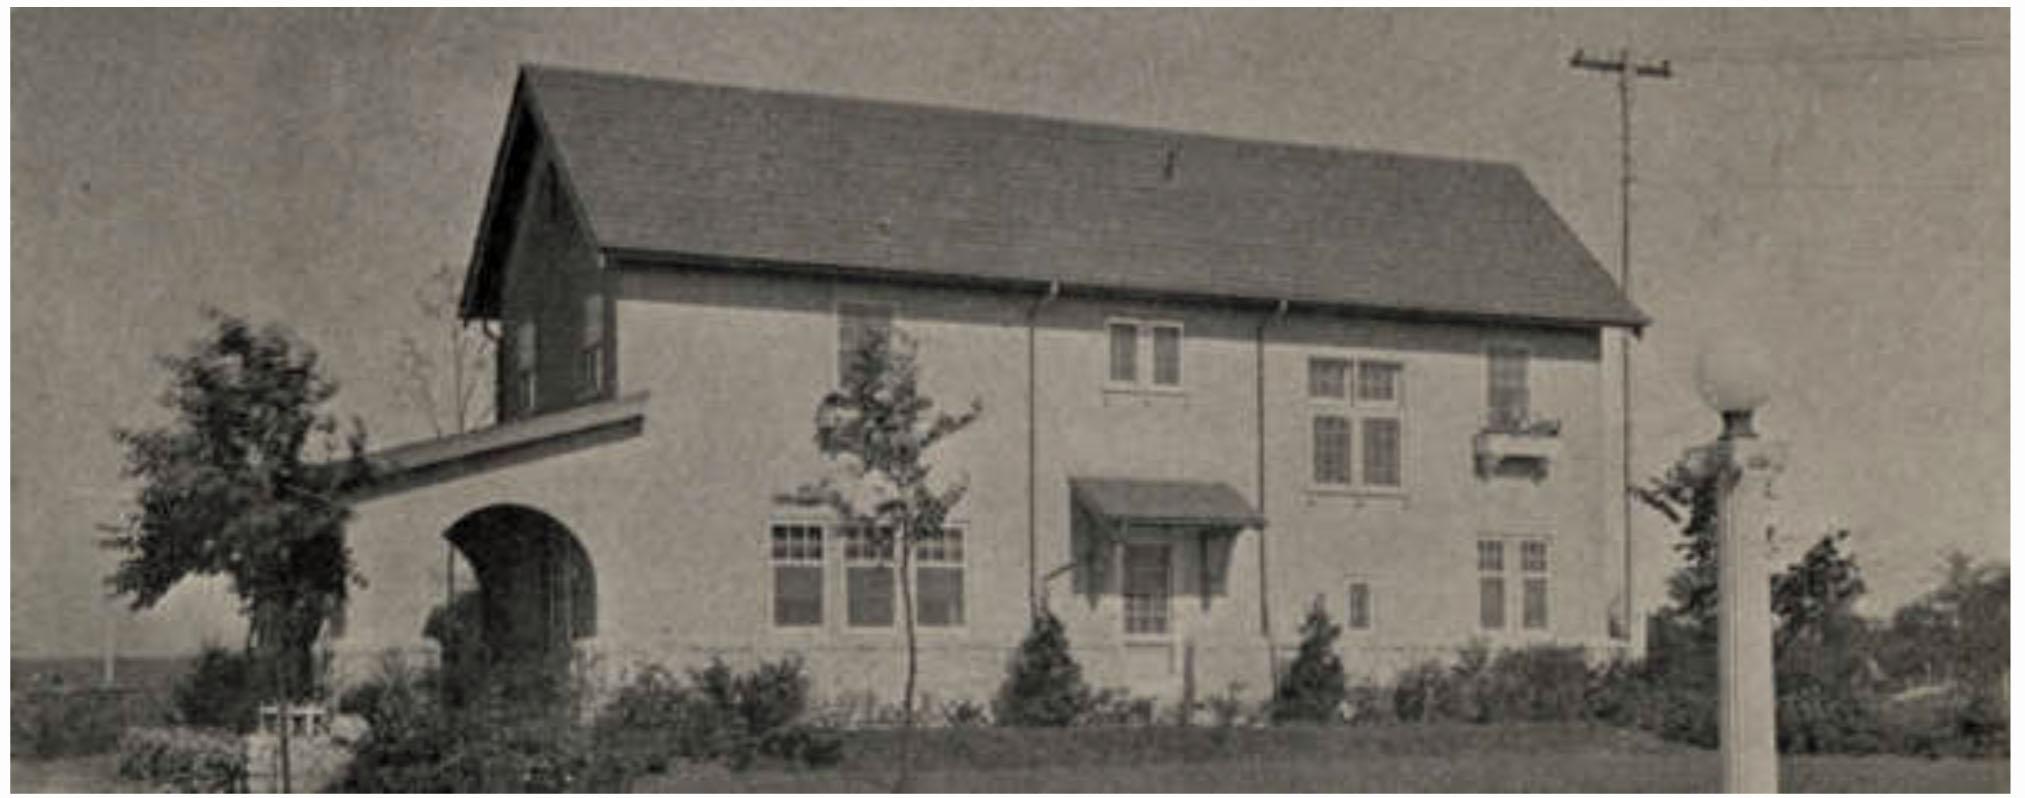 1761 Roxbury Road circa 1917. Vernacular style. (Courtesy of UA Archives.)